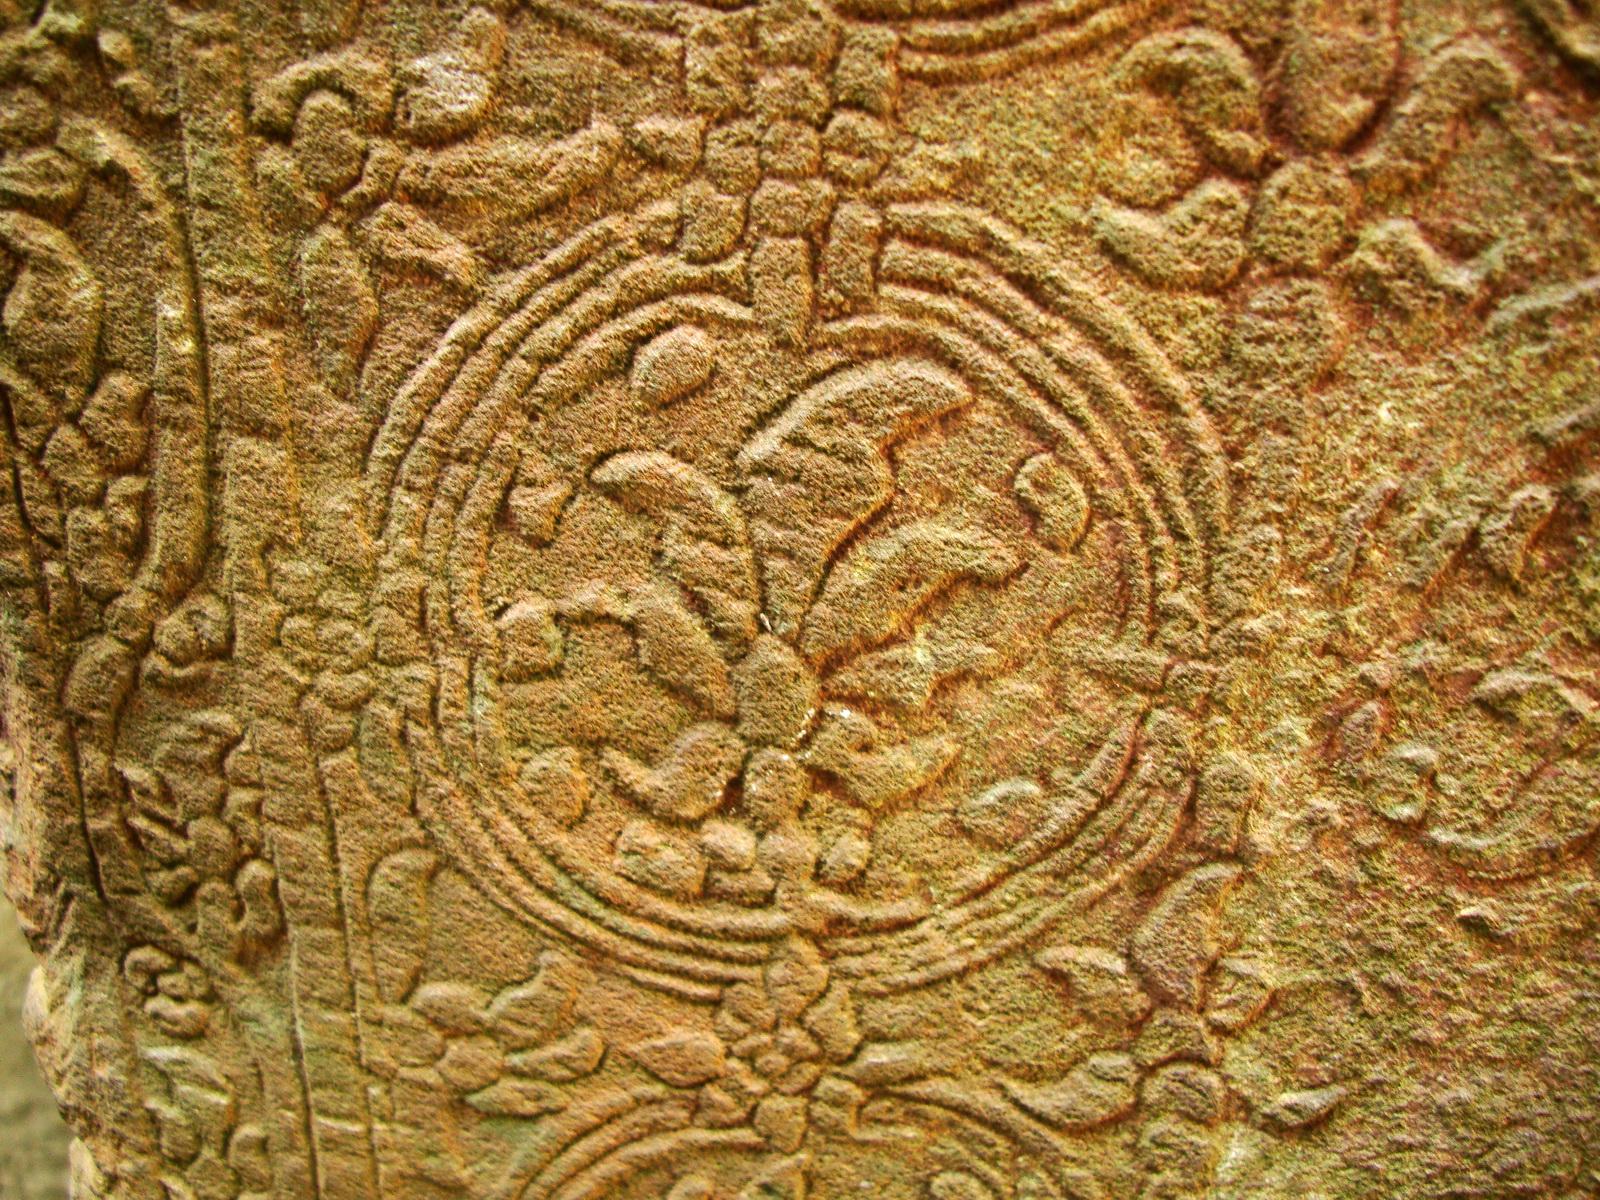 Preah Khan Temple Bas relief inner designs Preah Vihear province 03